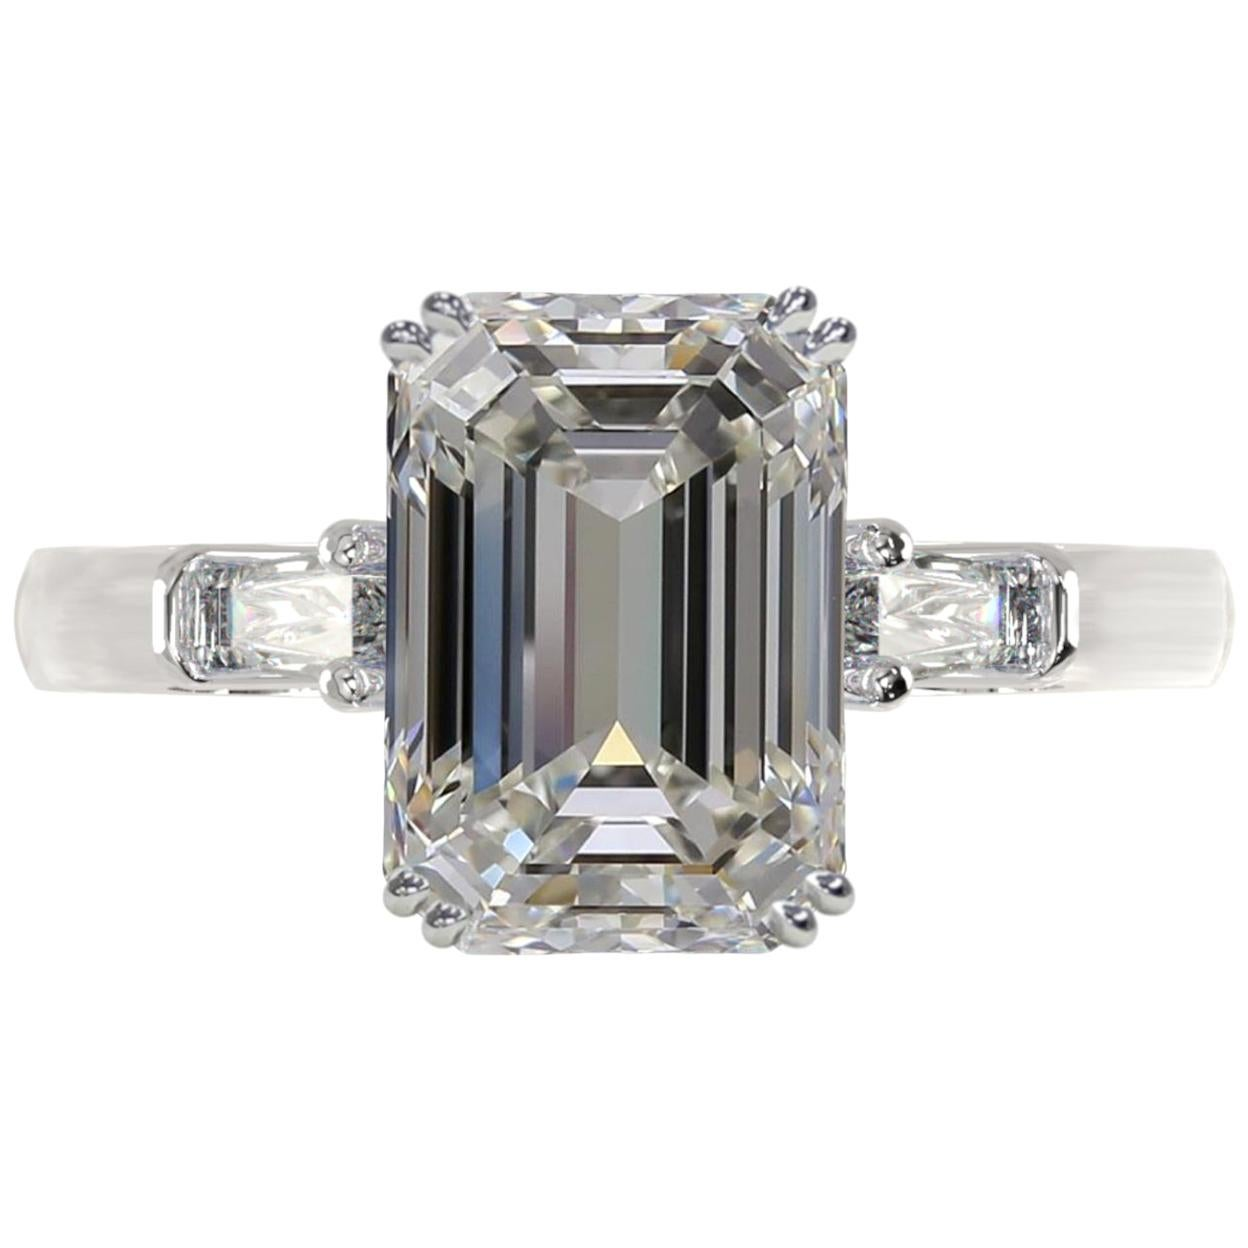 GIA Certified 4 Carat Emerald Cut Diamond Ring VVS1 Clarity G Color